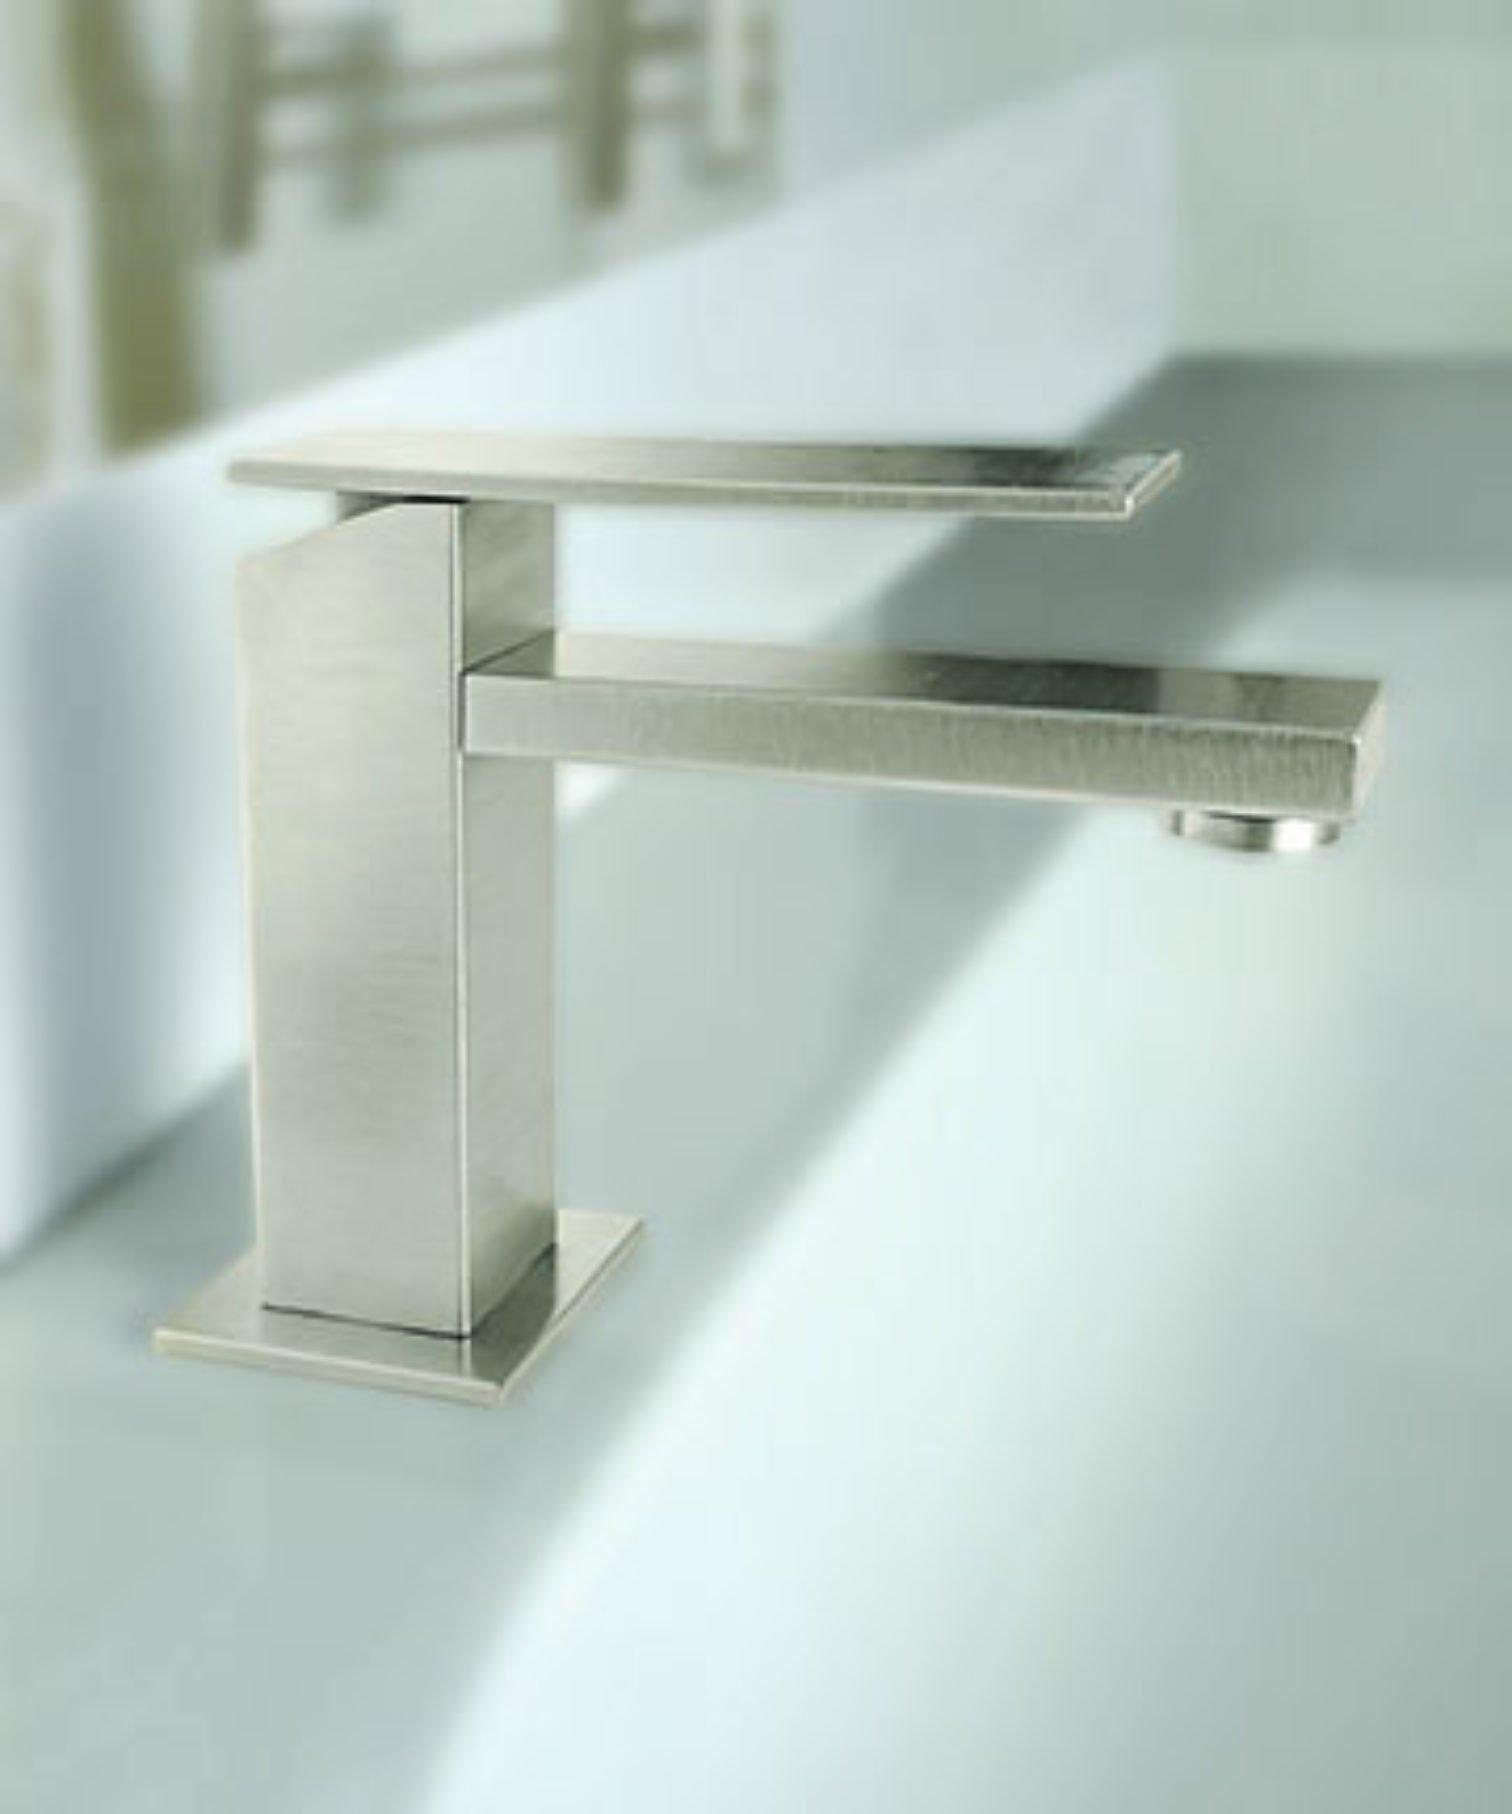 Morro Bay Single Hole Faucet on Sink